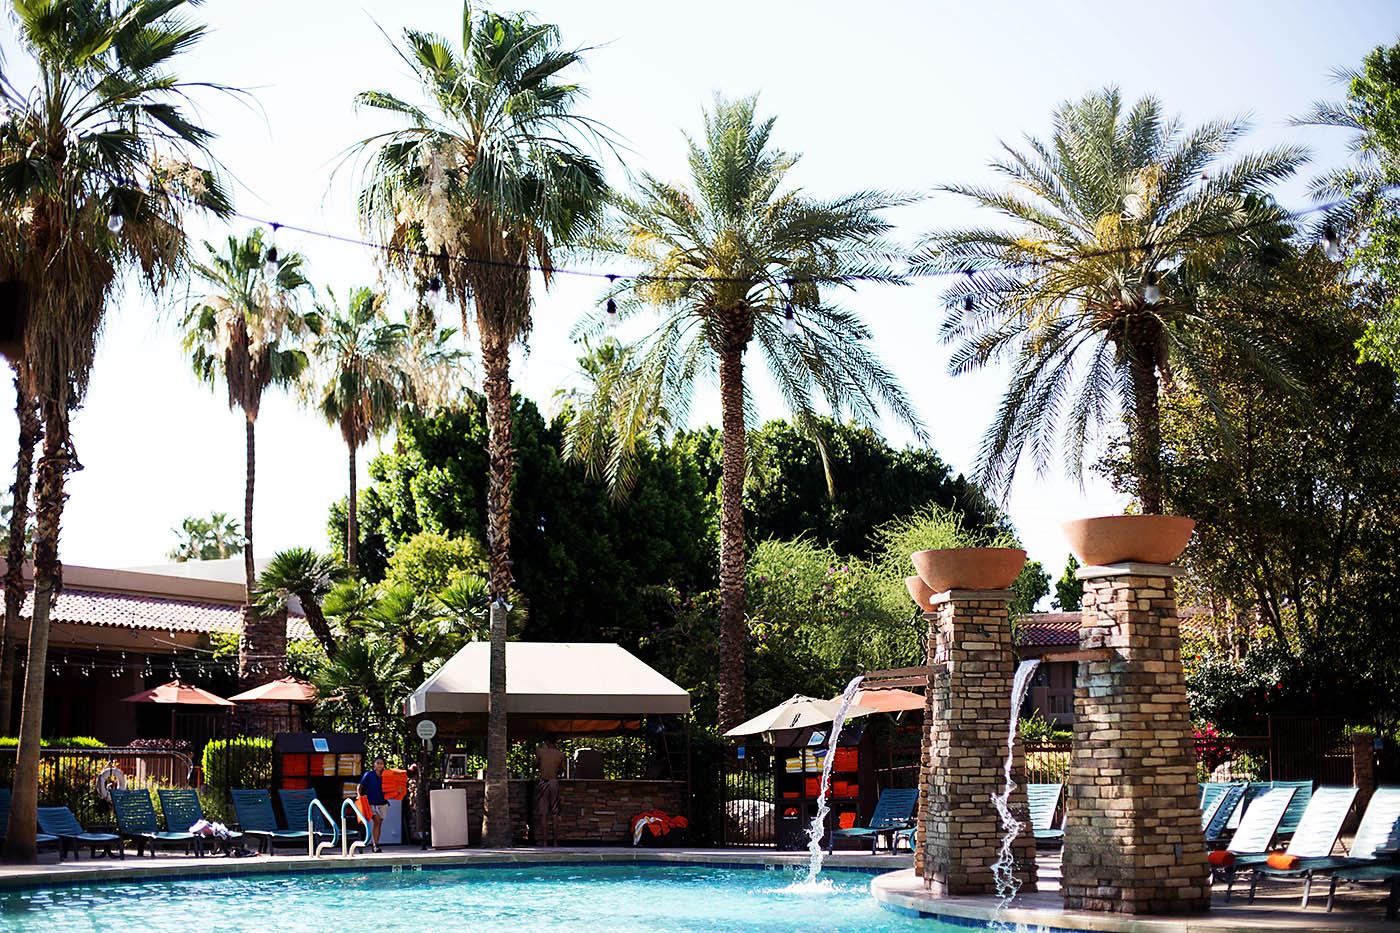 Firesky Resort & Spa in Scottsdale, AZ (plus a discount promo code!)